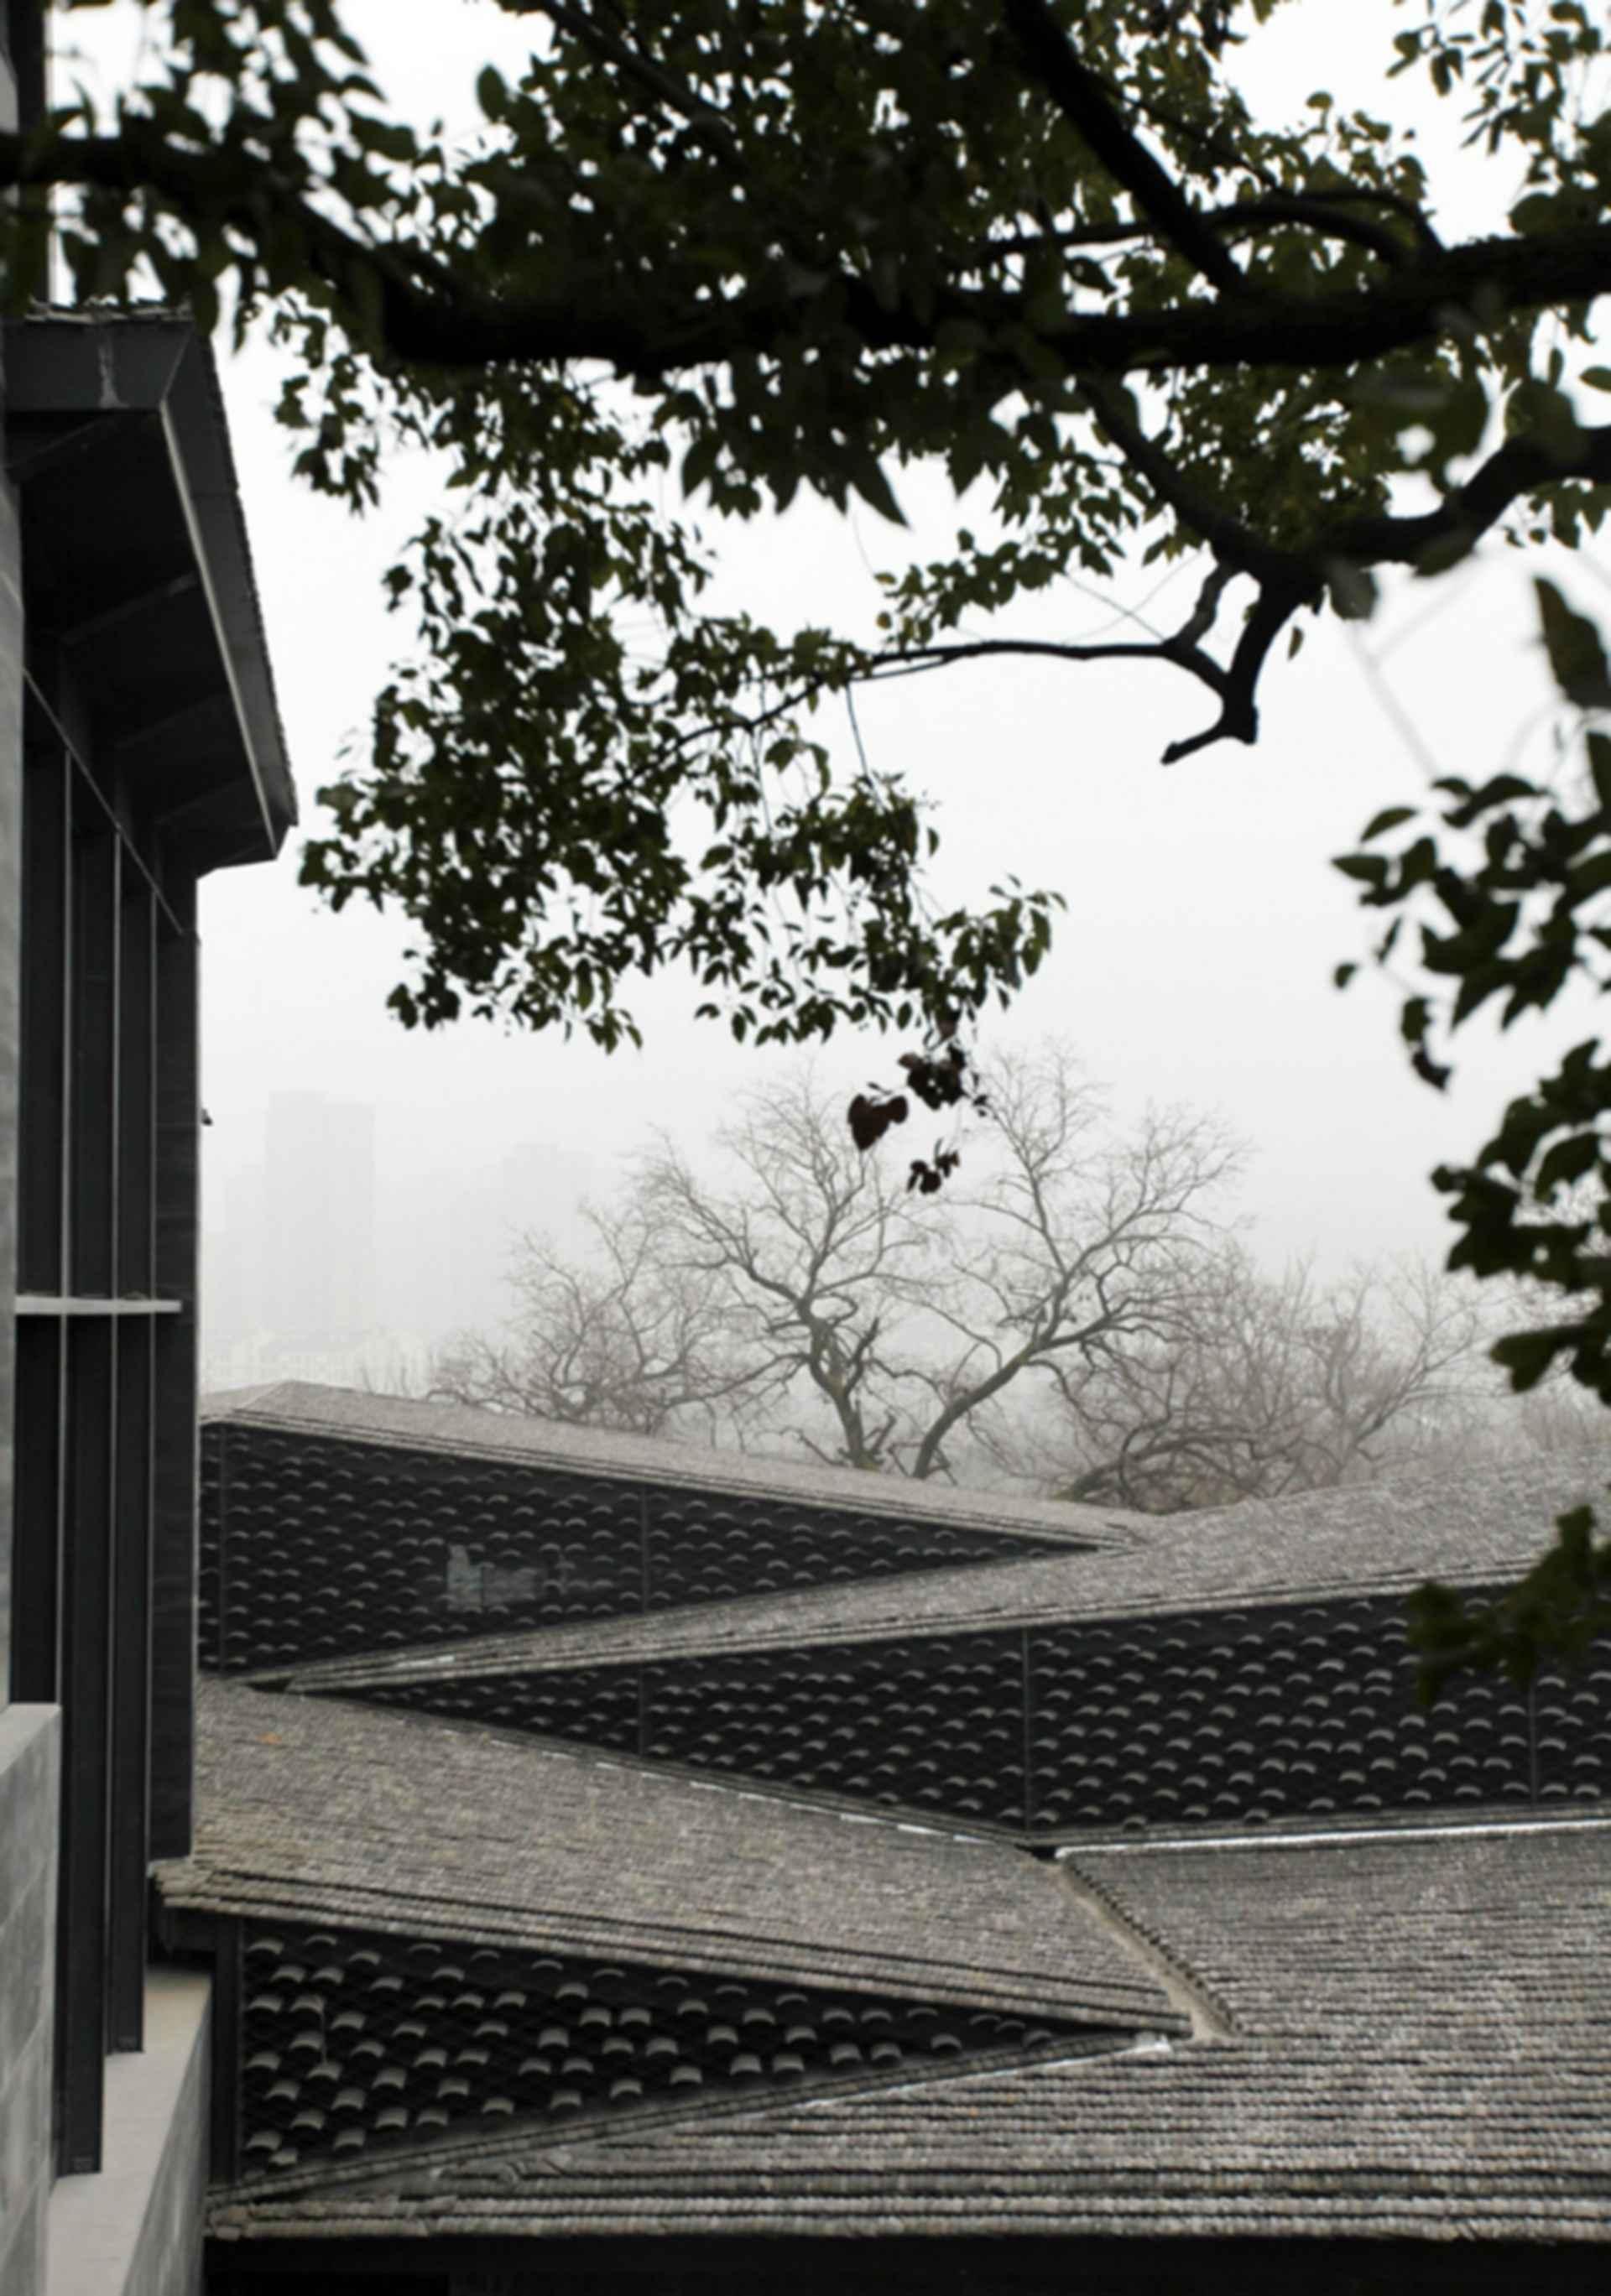 China Academy of Art's Folk Art Museum - Exterior